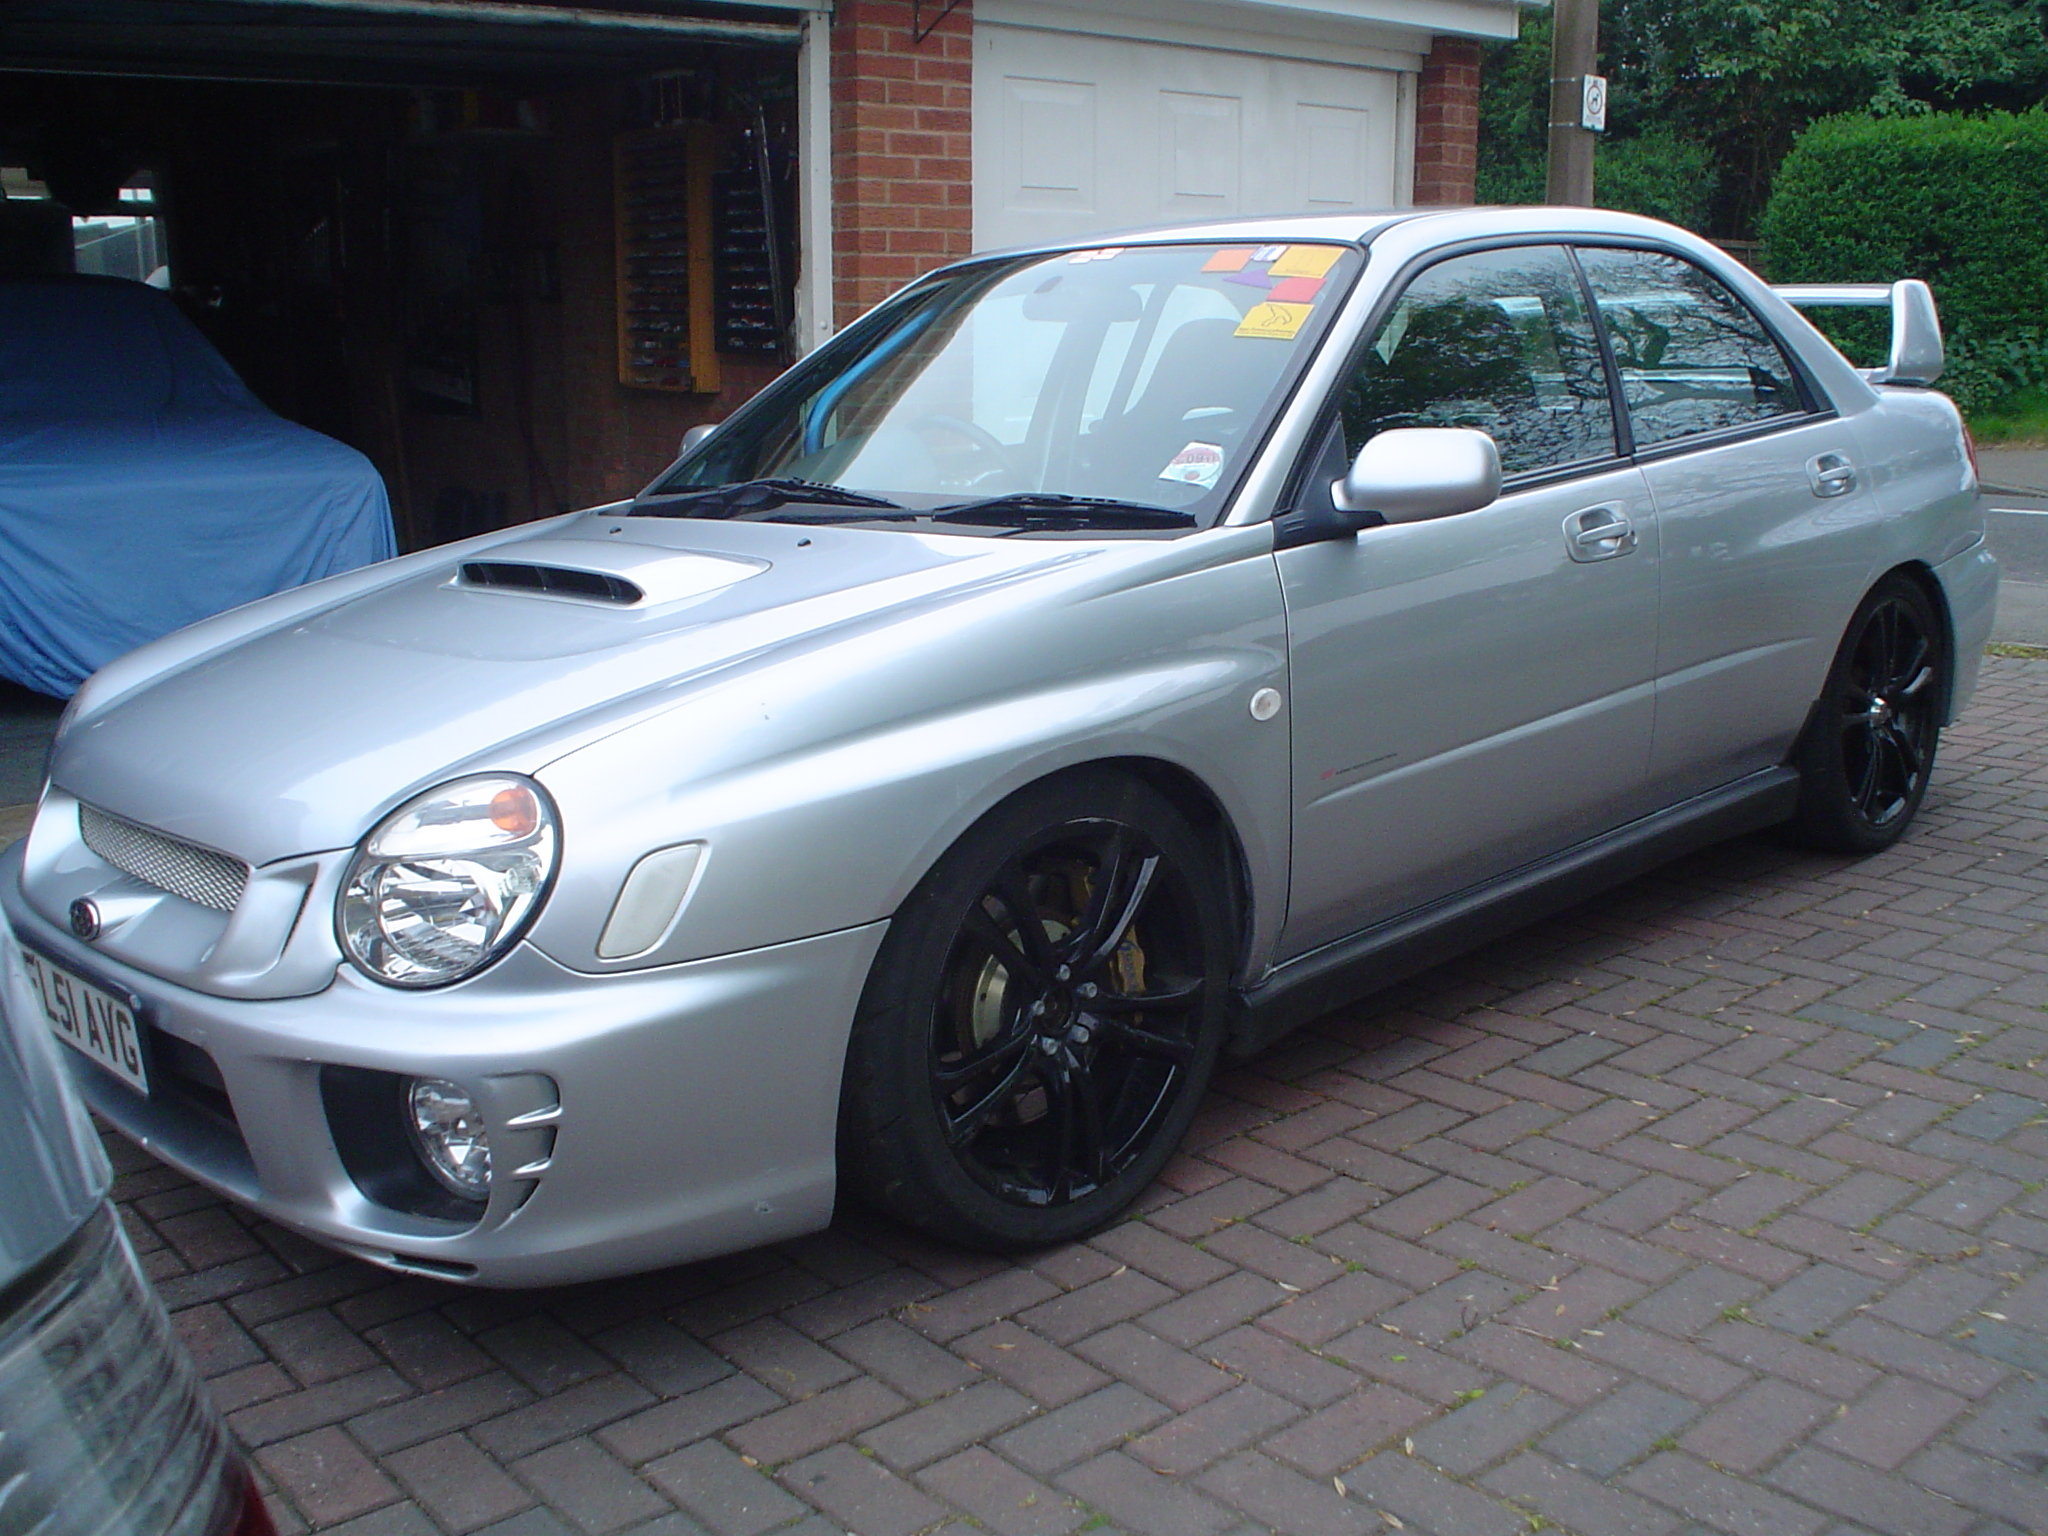 Sti For Sale >> subaru impreza wrx bugeye 51 reg track car